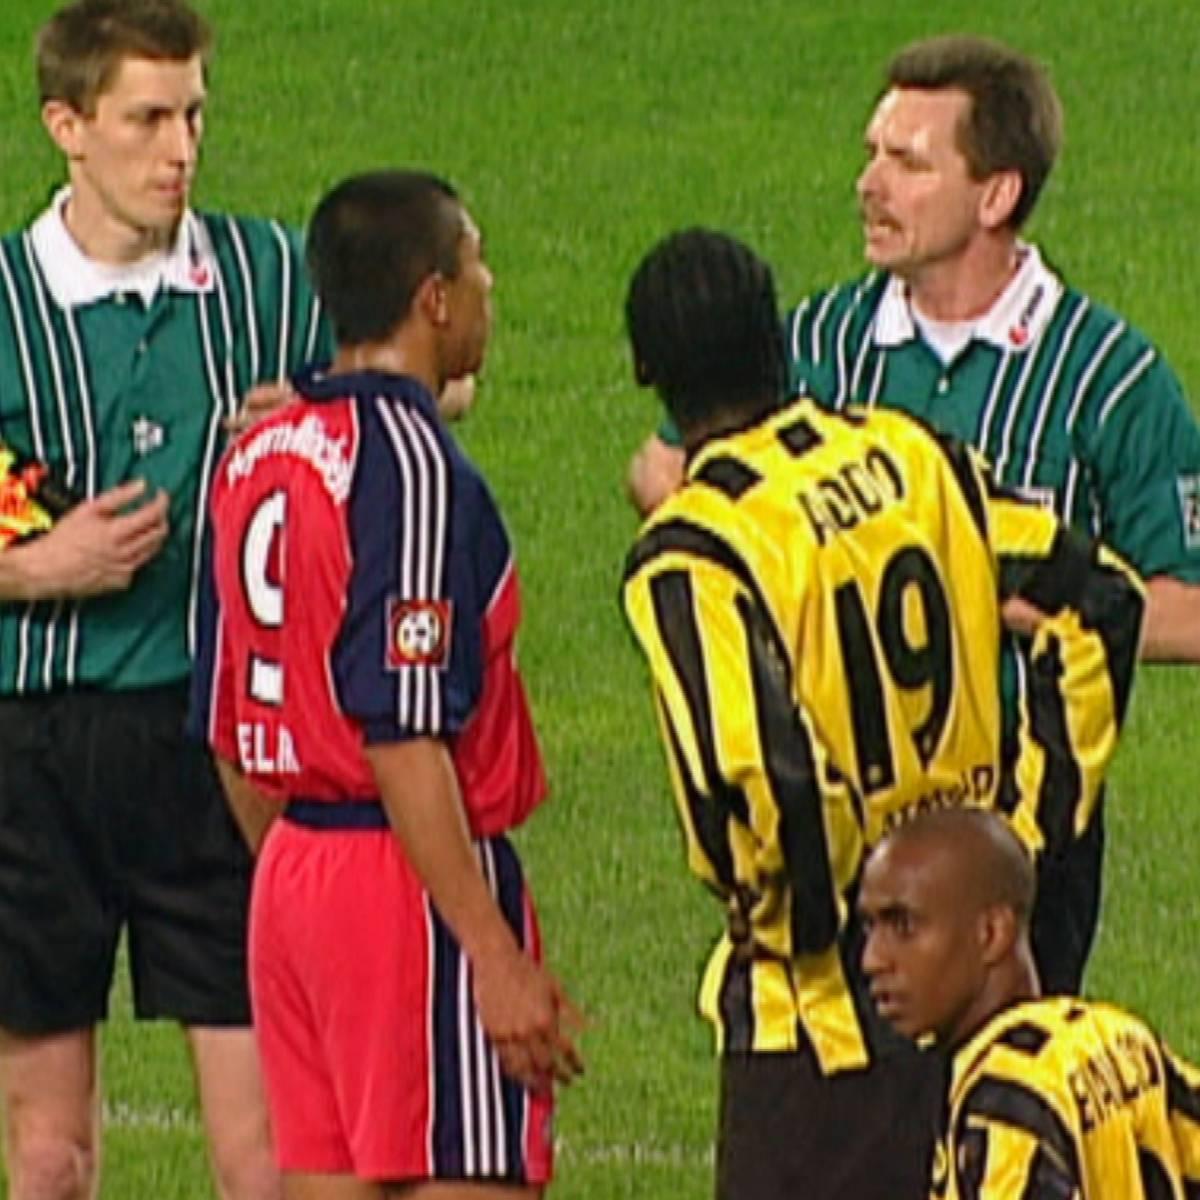 Kartenflut! Als Dortmund vs. Bayern eskalierte